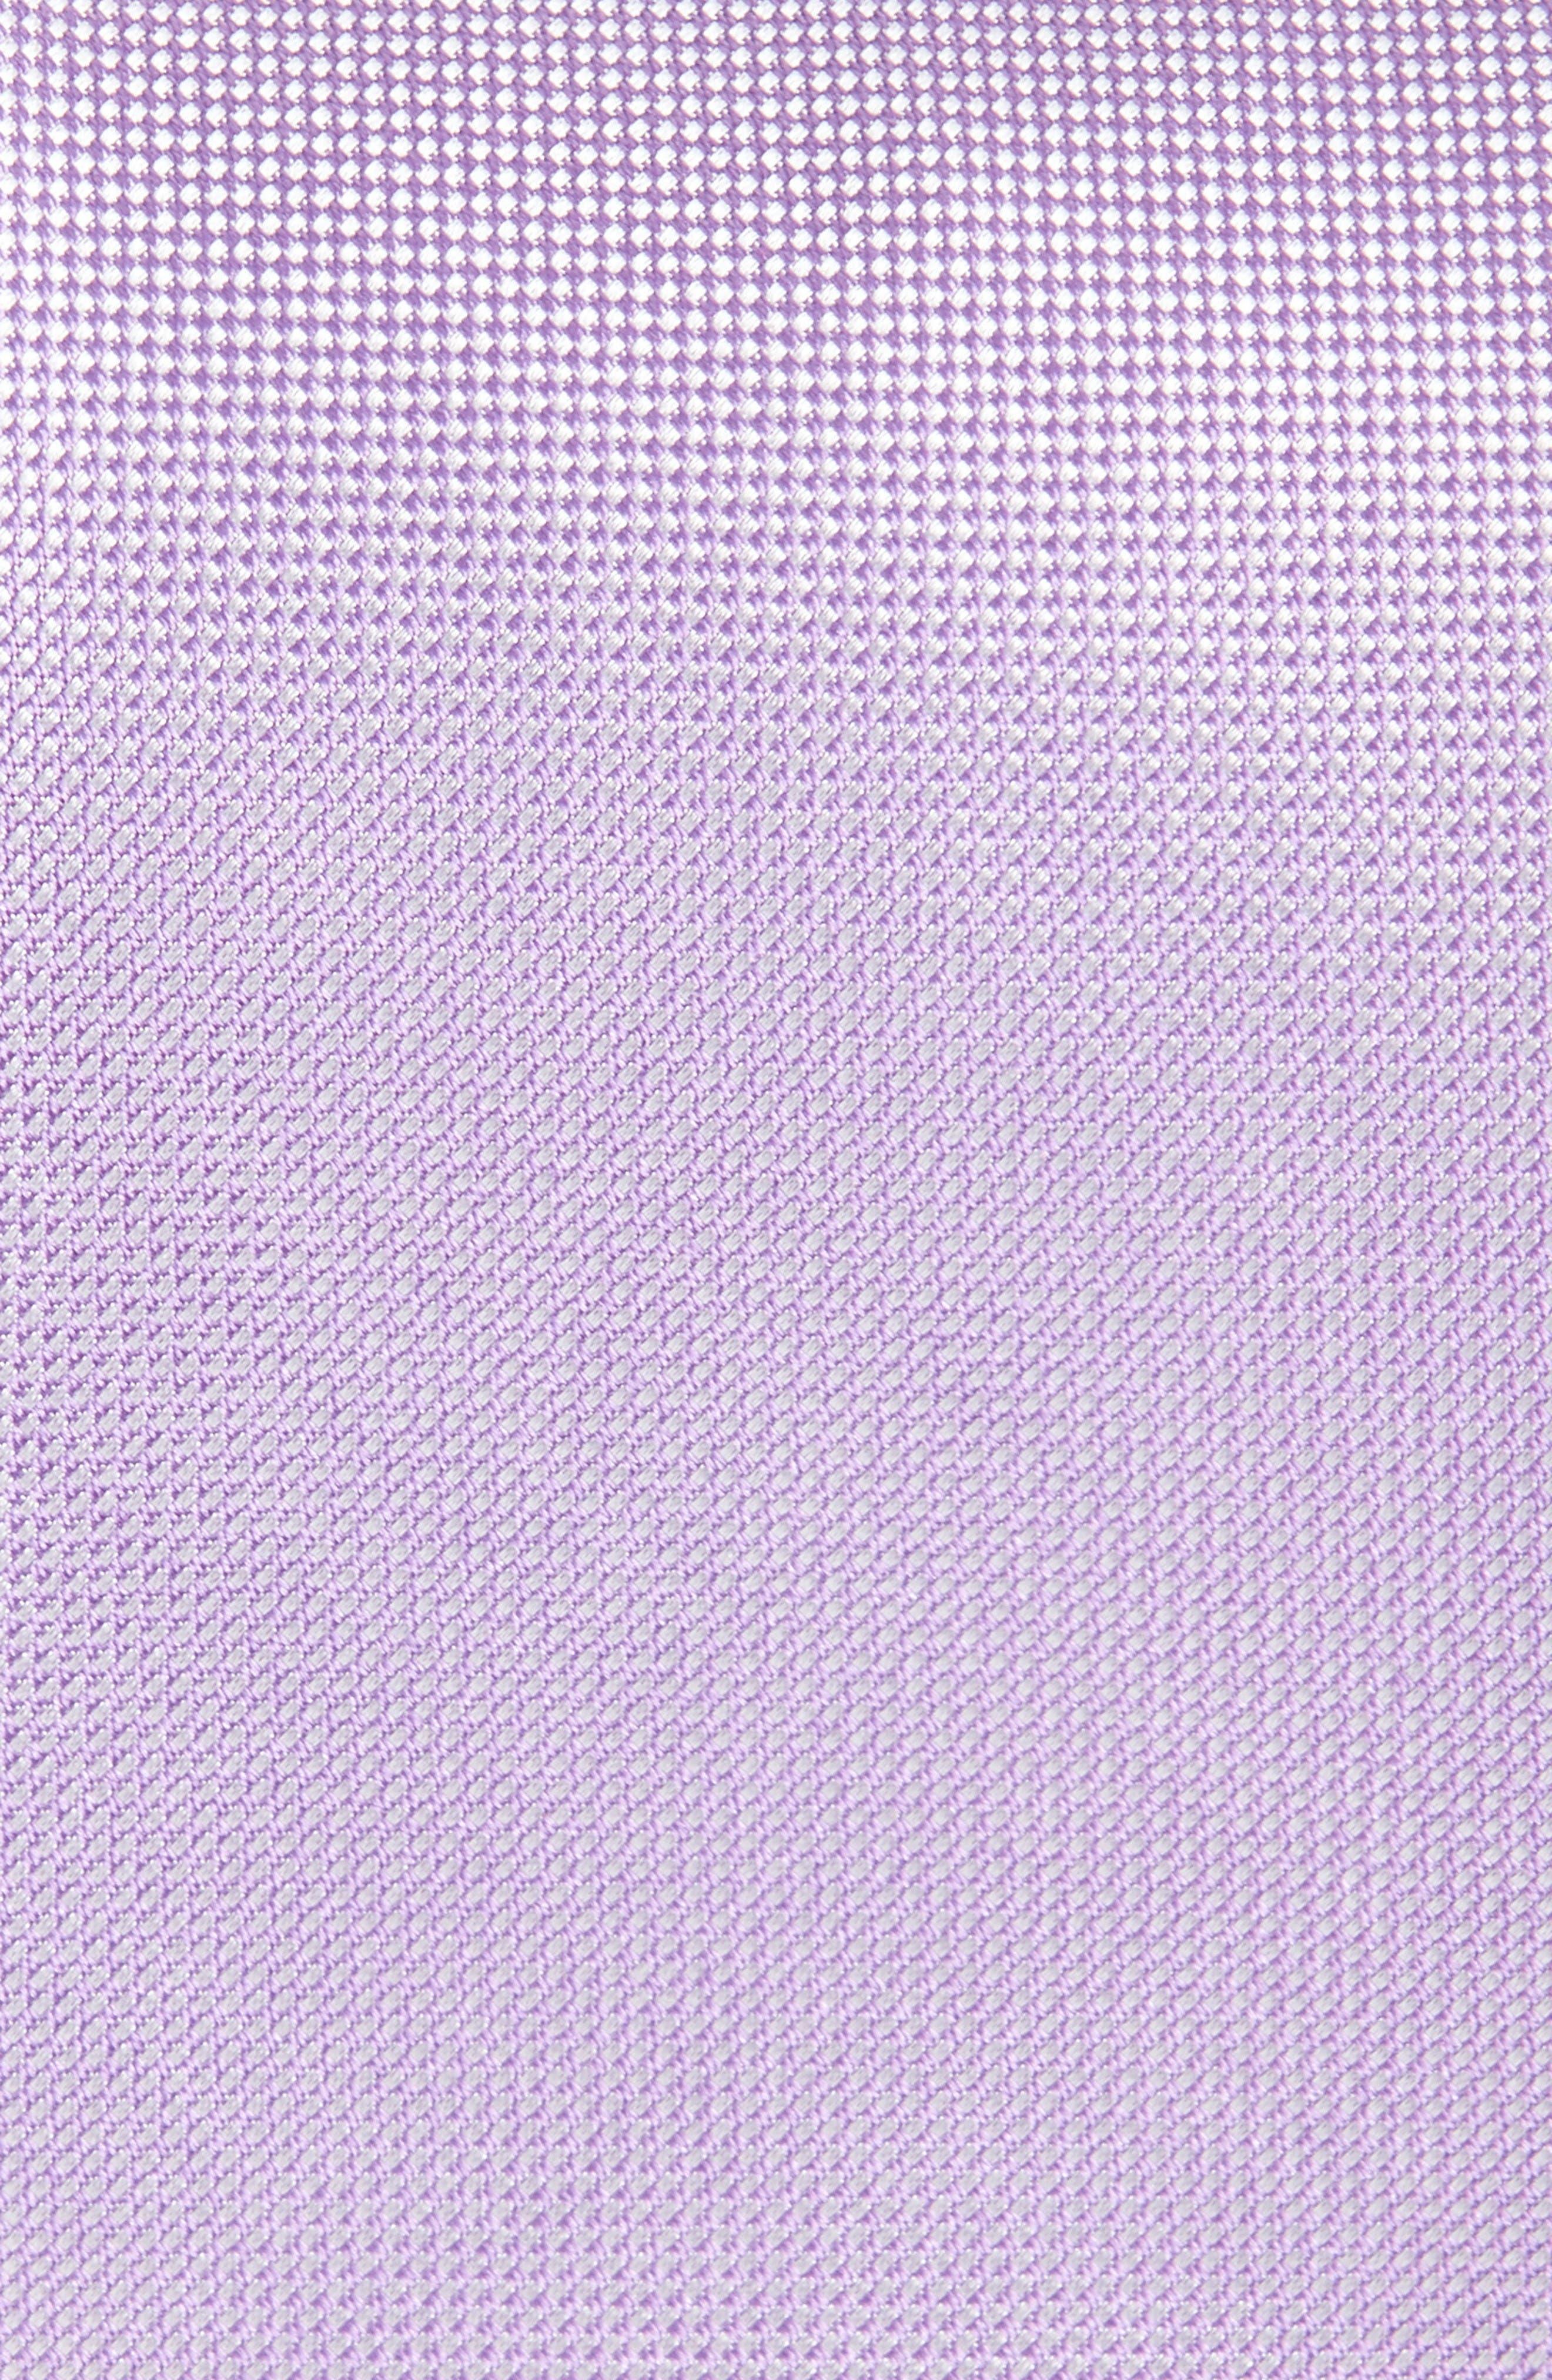 Foley Silk Tie,                             Alternate thumbnail 2, color,                             Purple